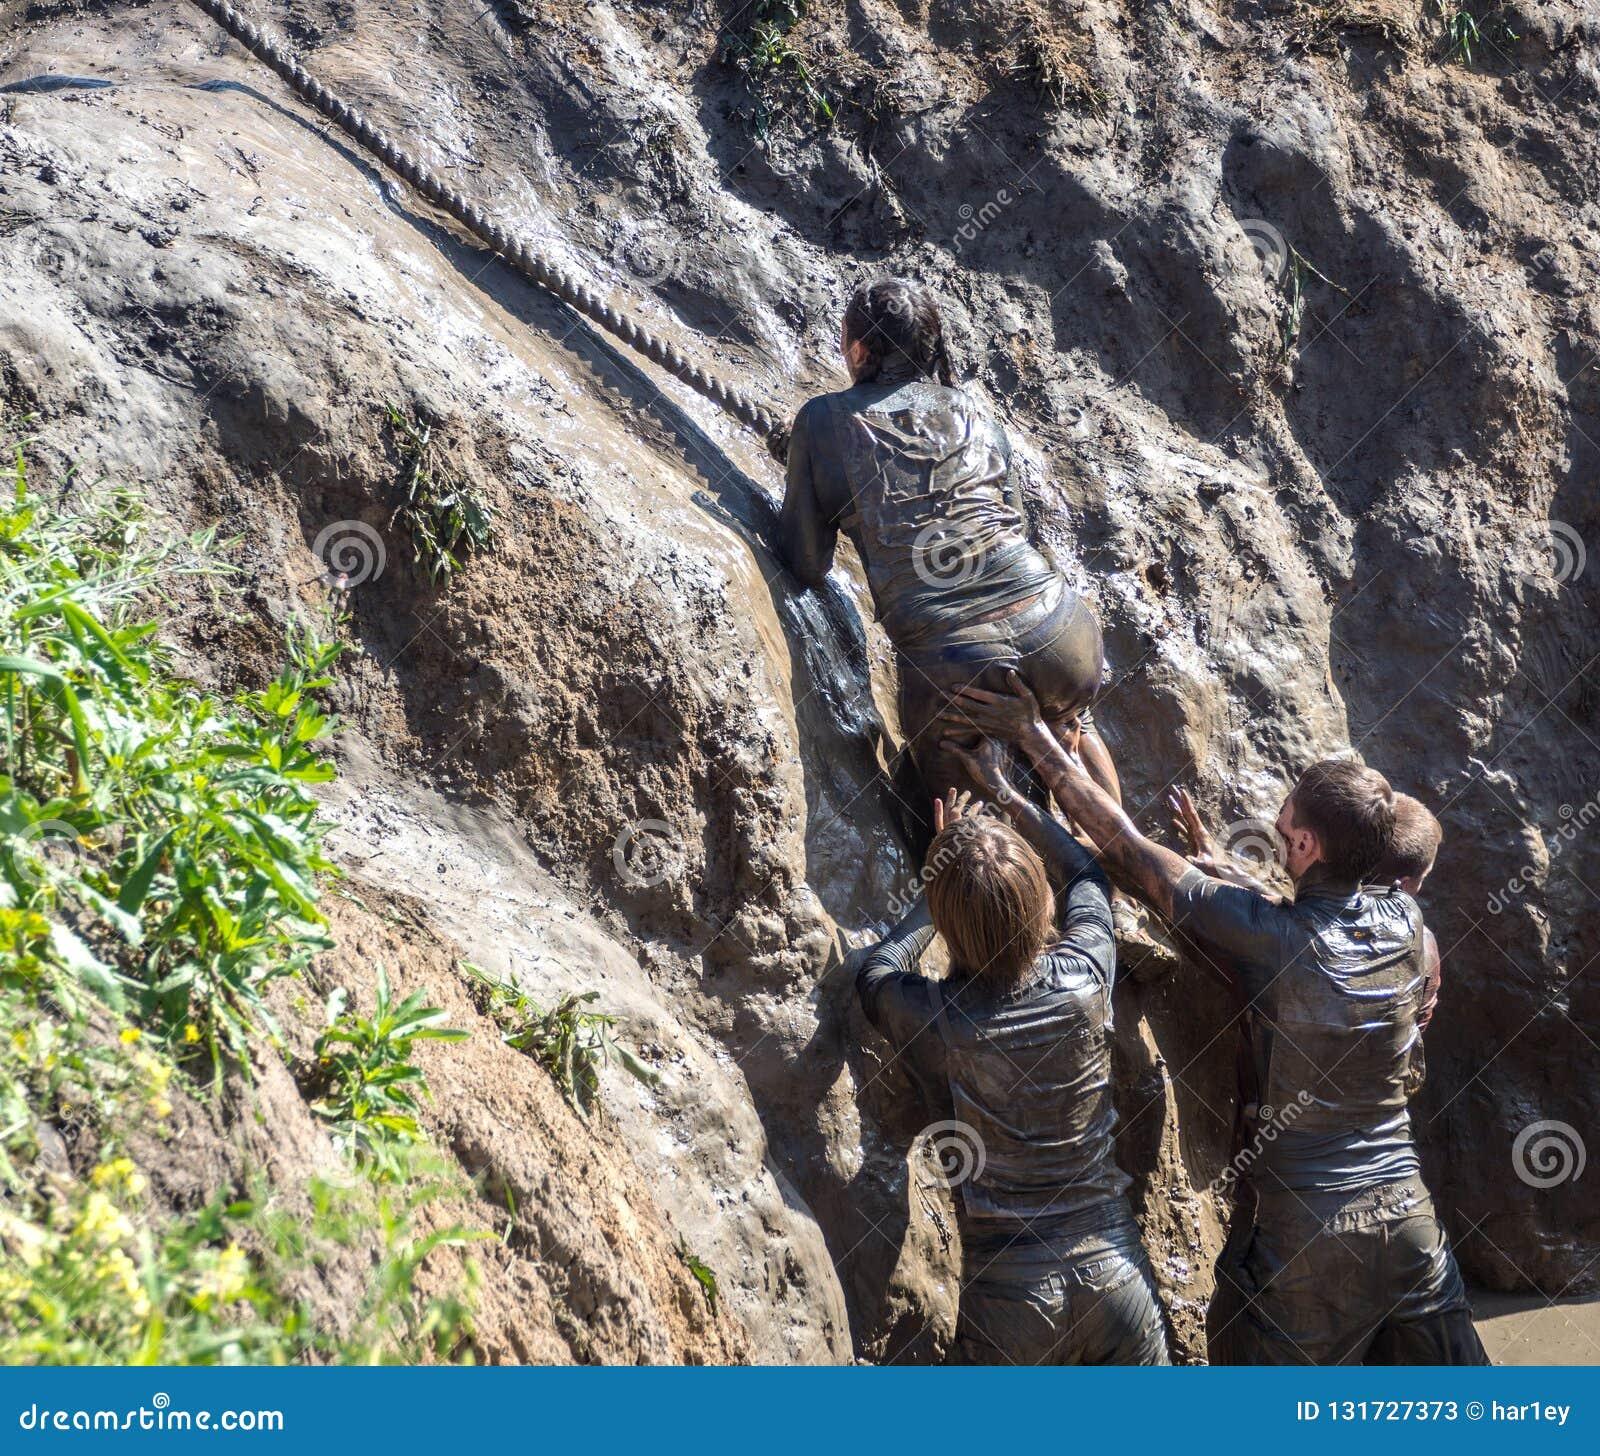 Os jovens passam o curso de obstáculo Corredores de raça da lama Escalando a corda teamwork